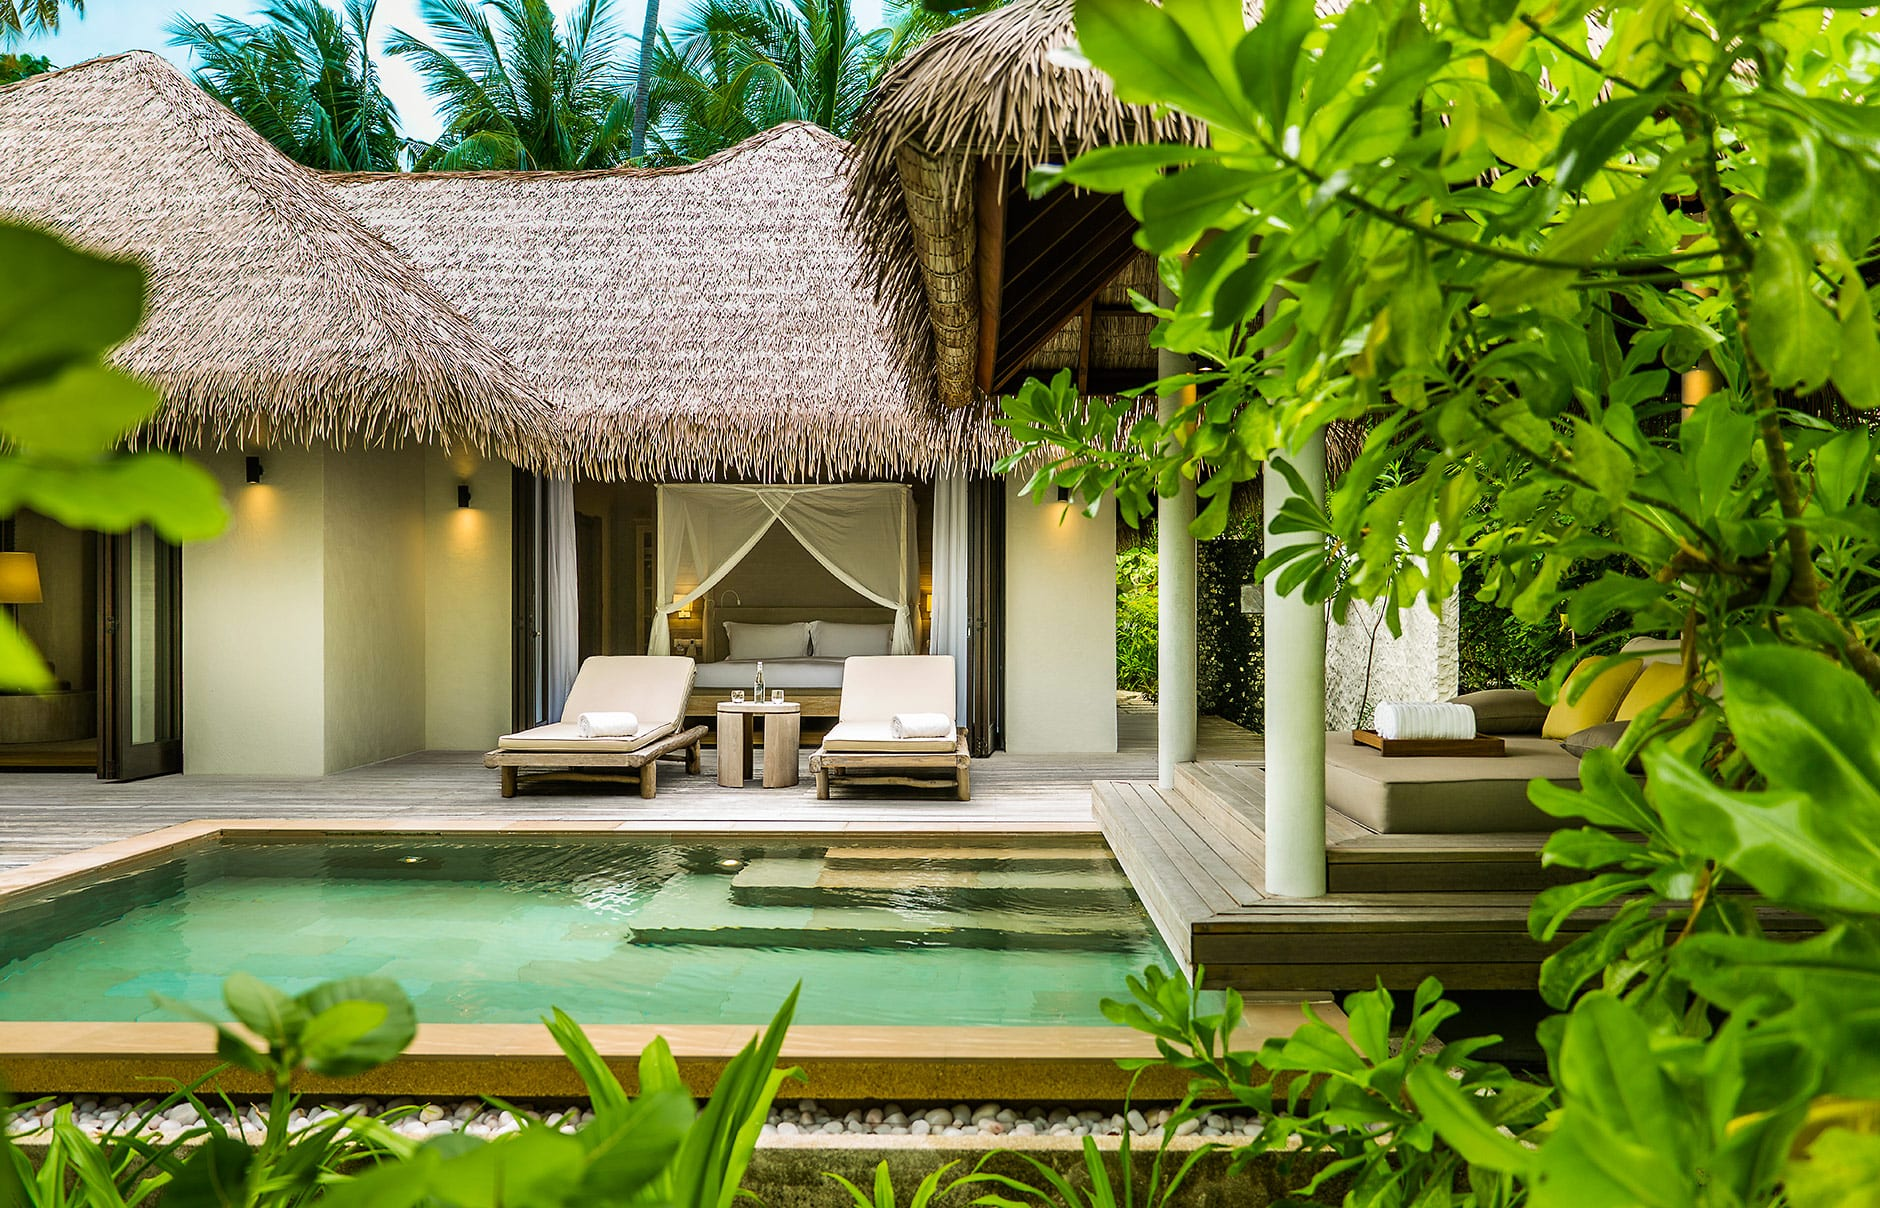 Beach Villa. Maalifushi by COMO, Maldives. © COMO Hotels & Resorts